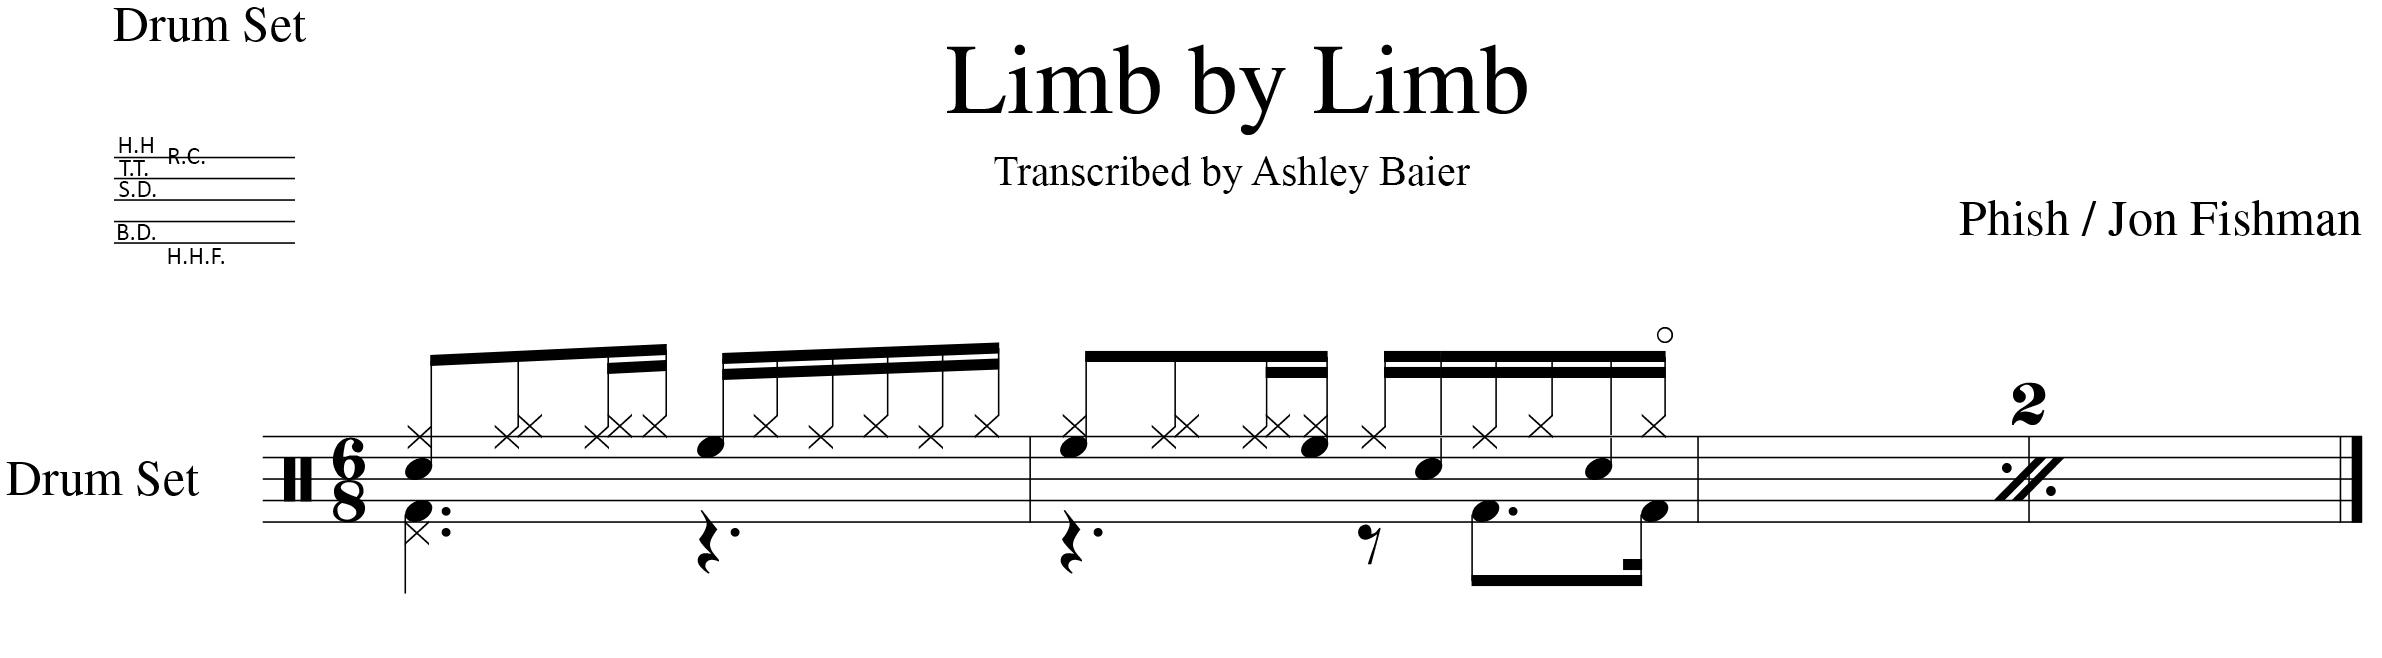 Limb by Limb - Drum Set.jpg